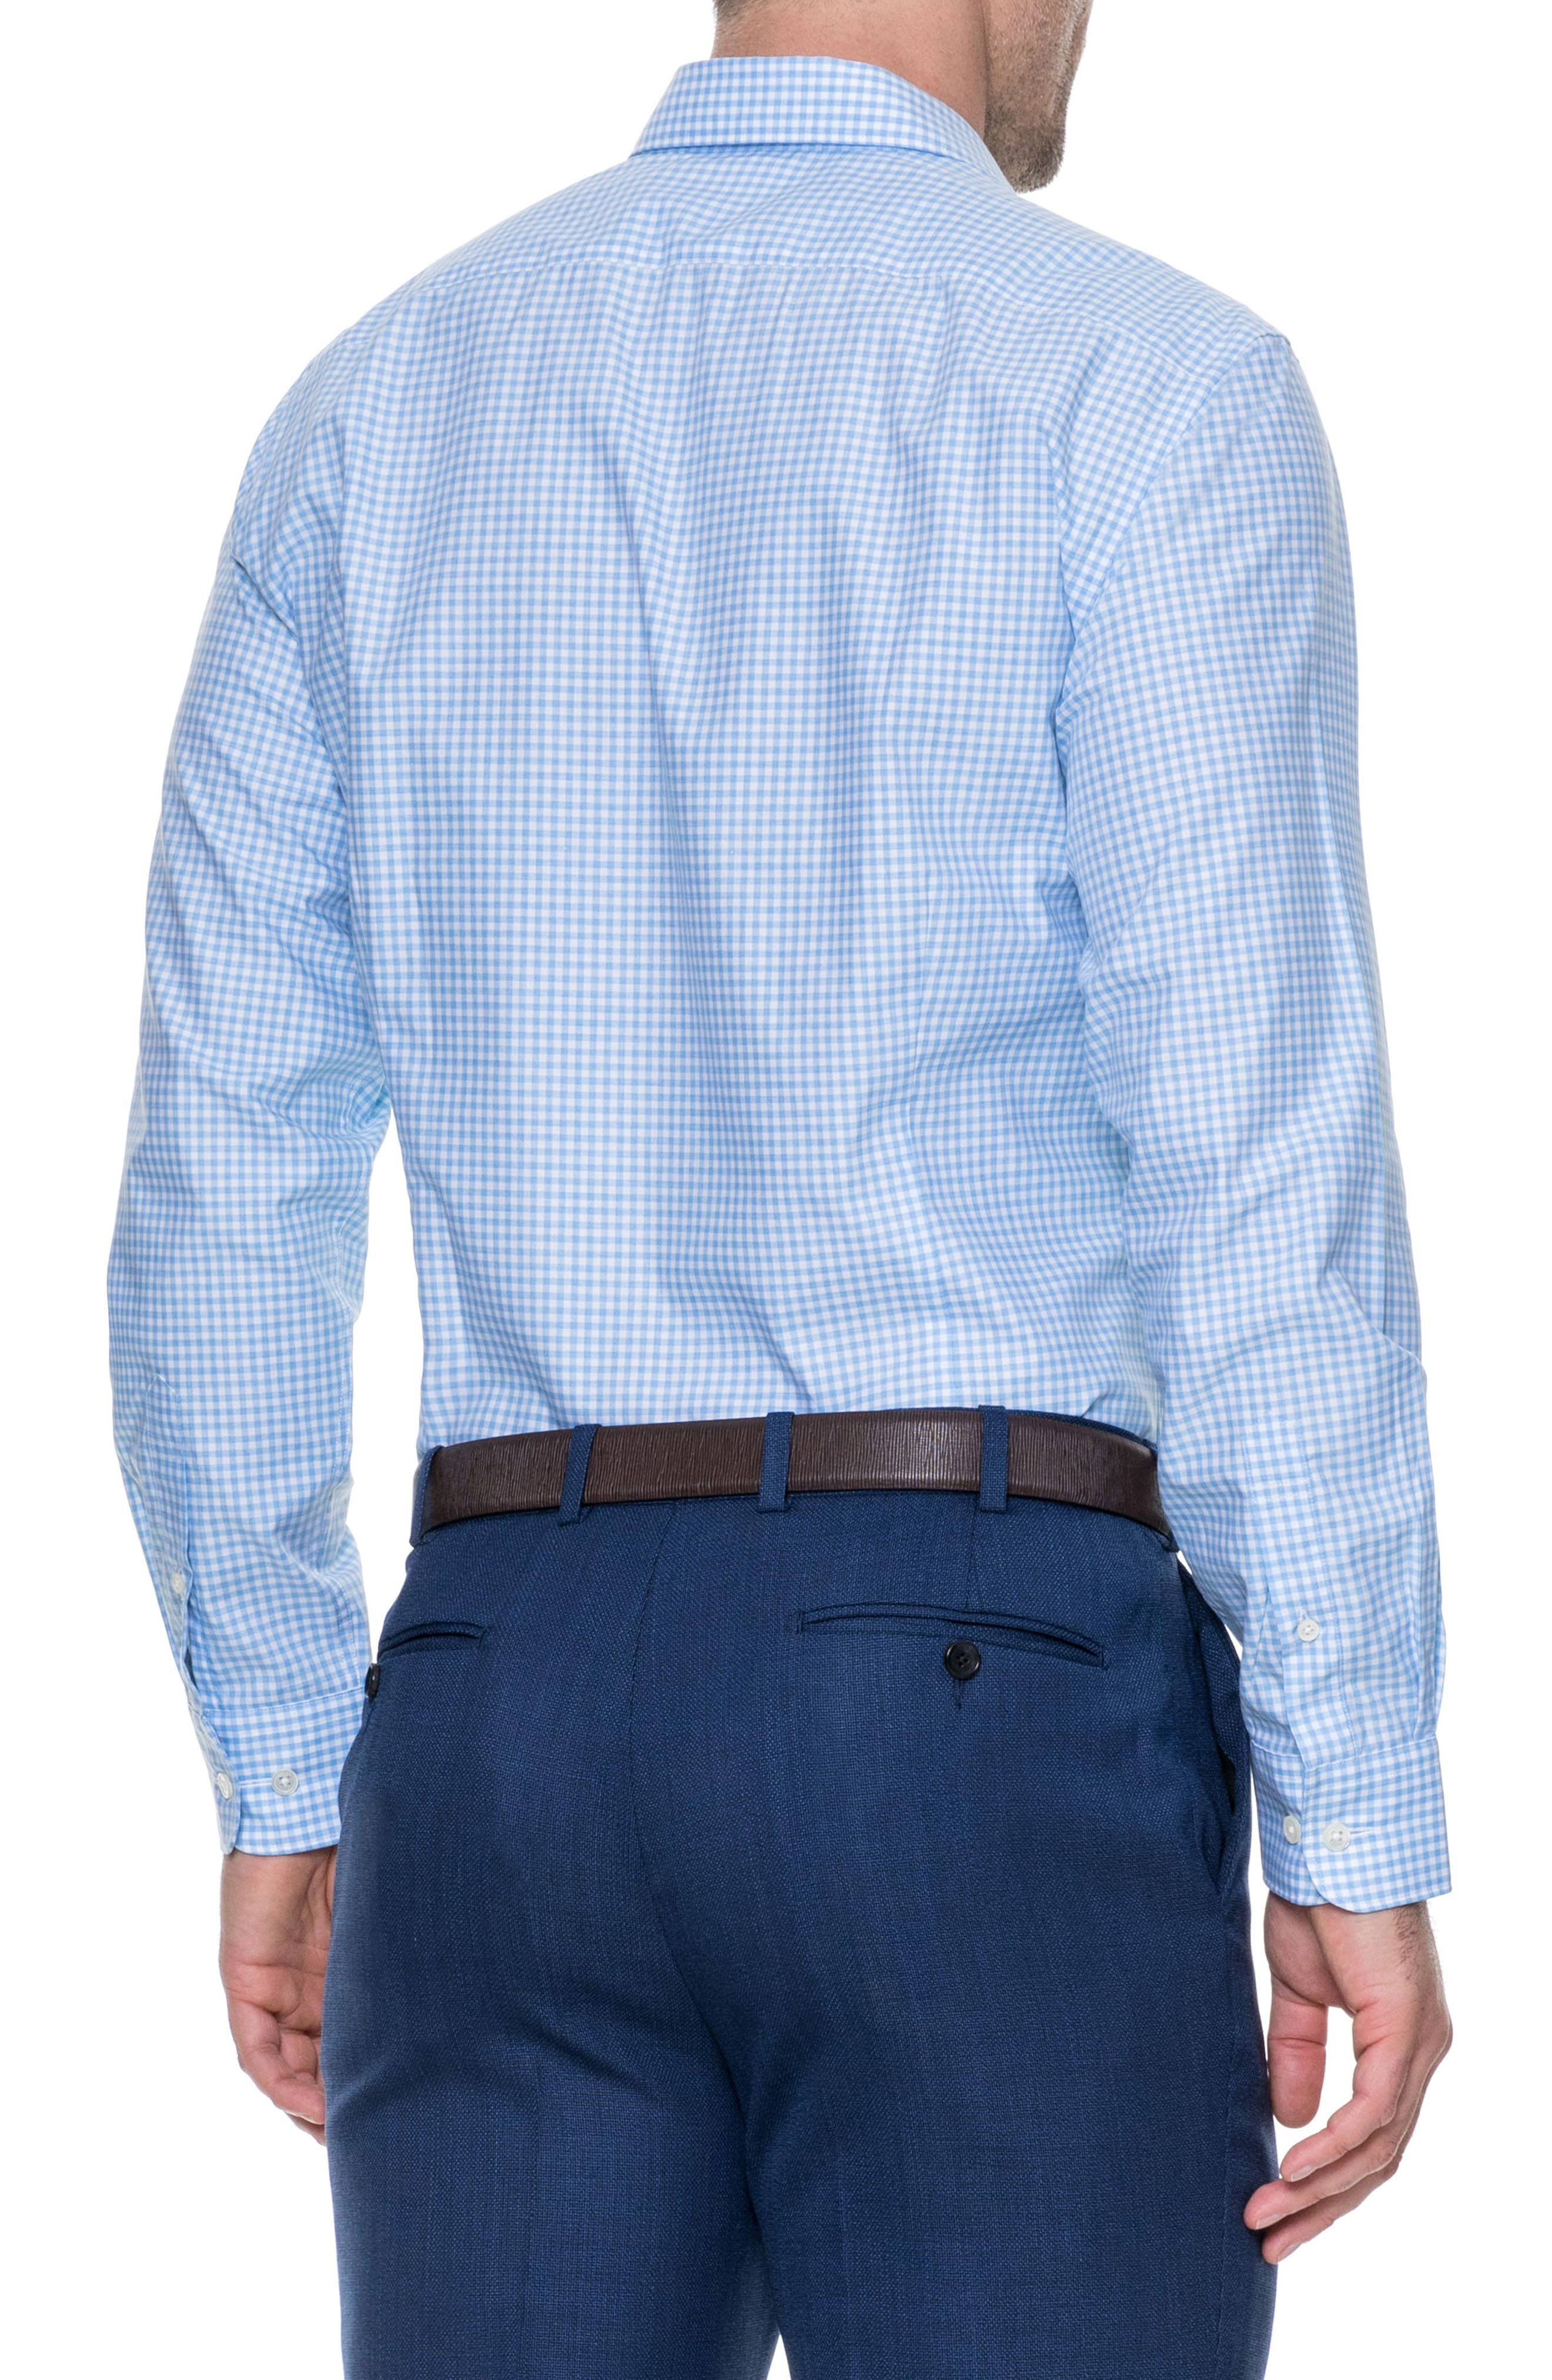 Tudor Slim Fit Check Sport Shirt,                             Alternate thumbnail 2, color,                             Sky